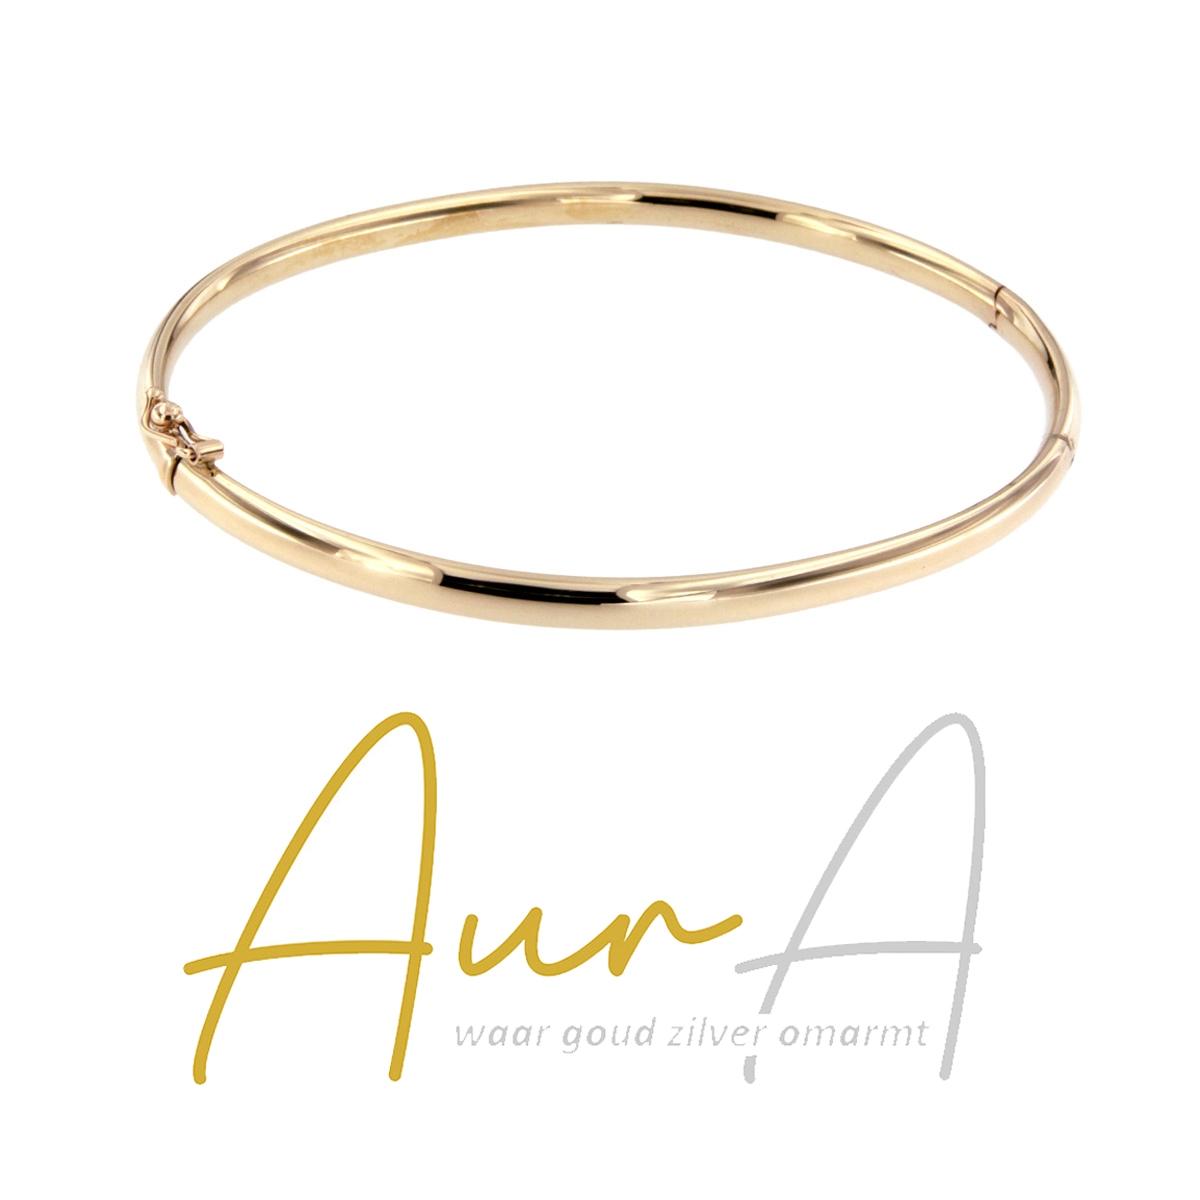 AurA Slavenbanden